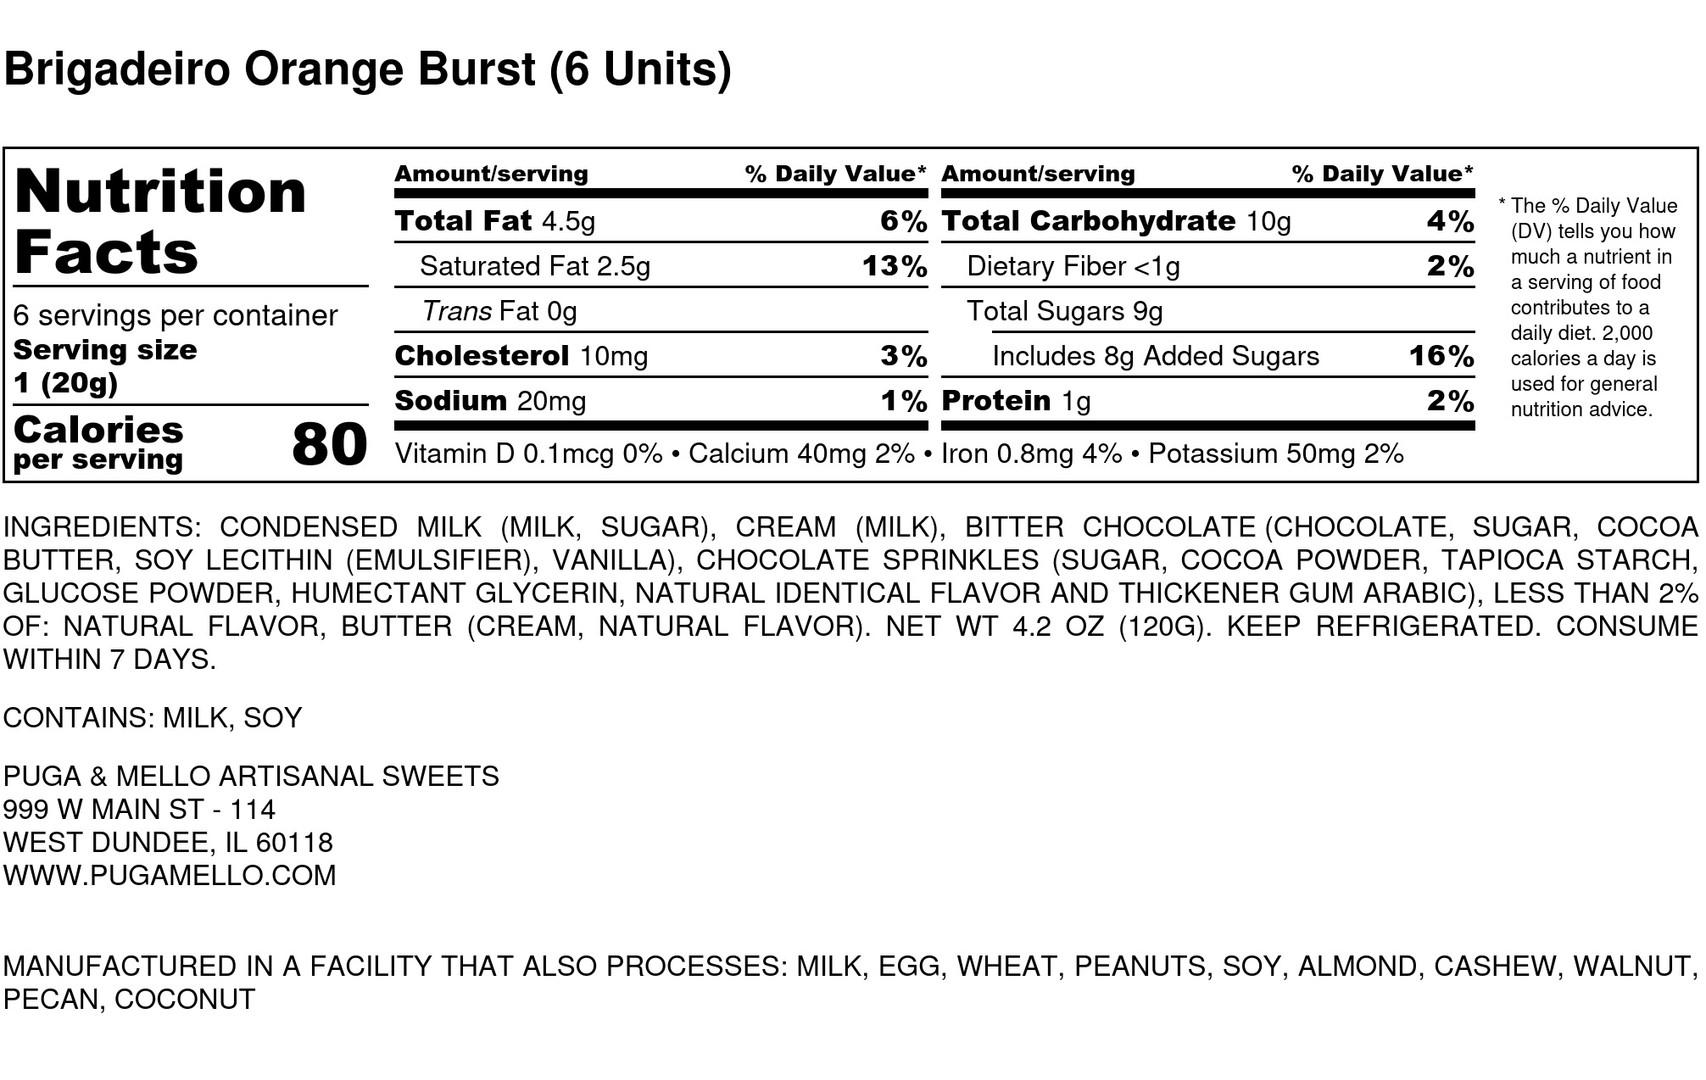 Brigadeiro Orange Burst (6 Units) - Nutr